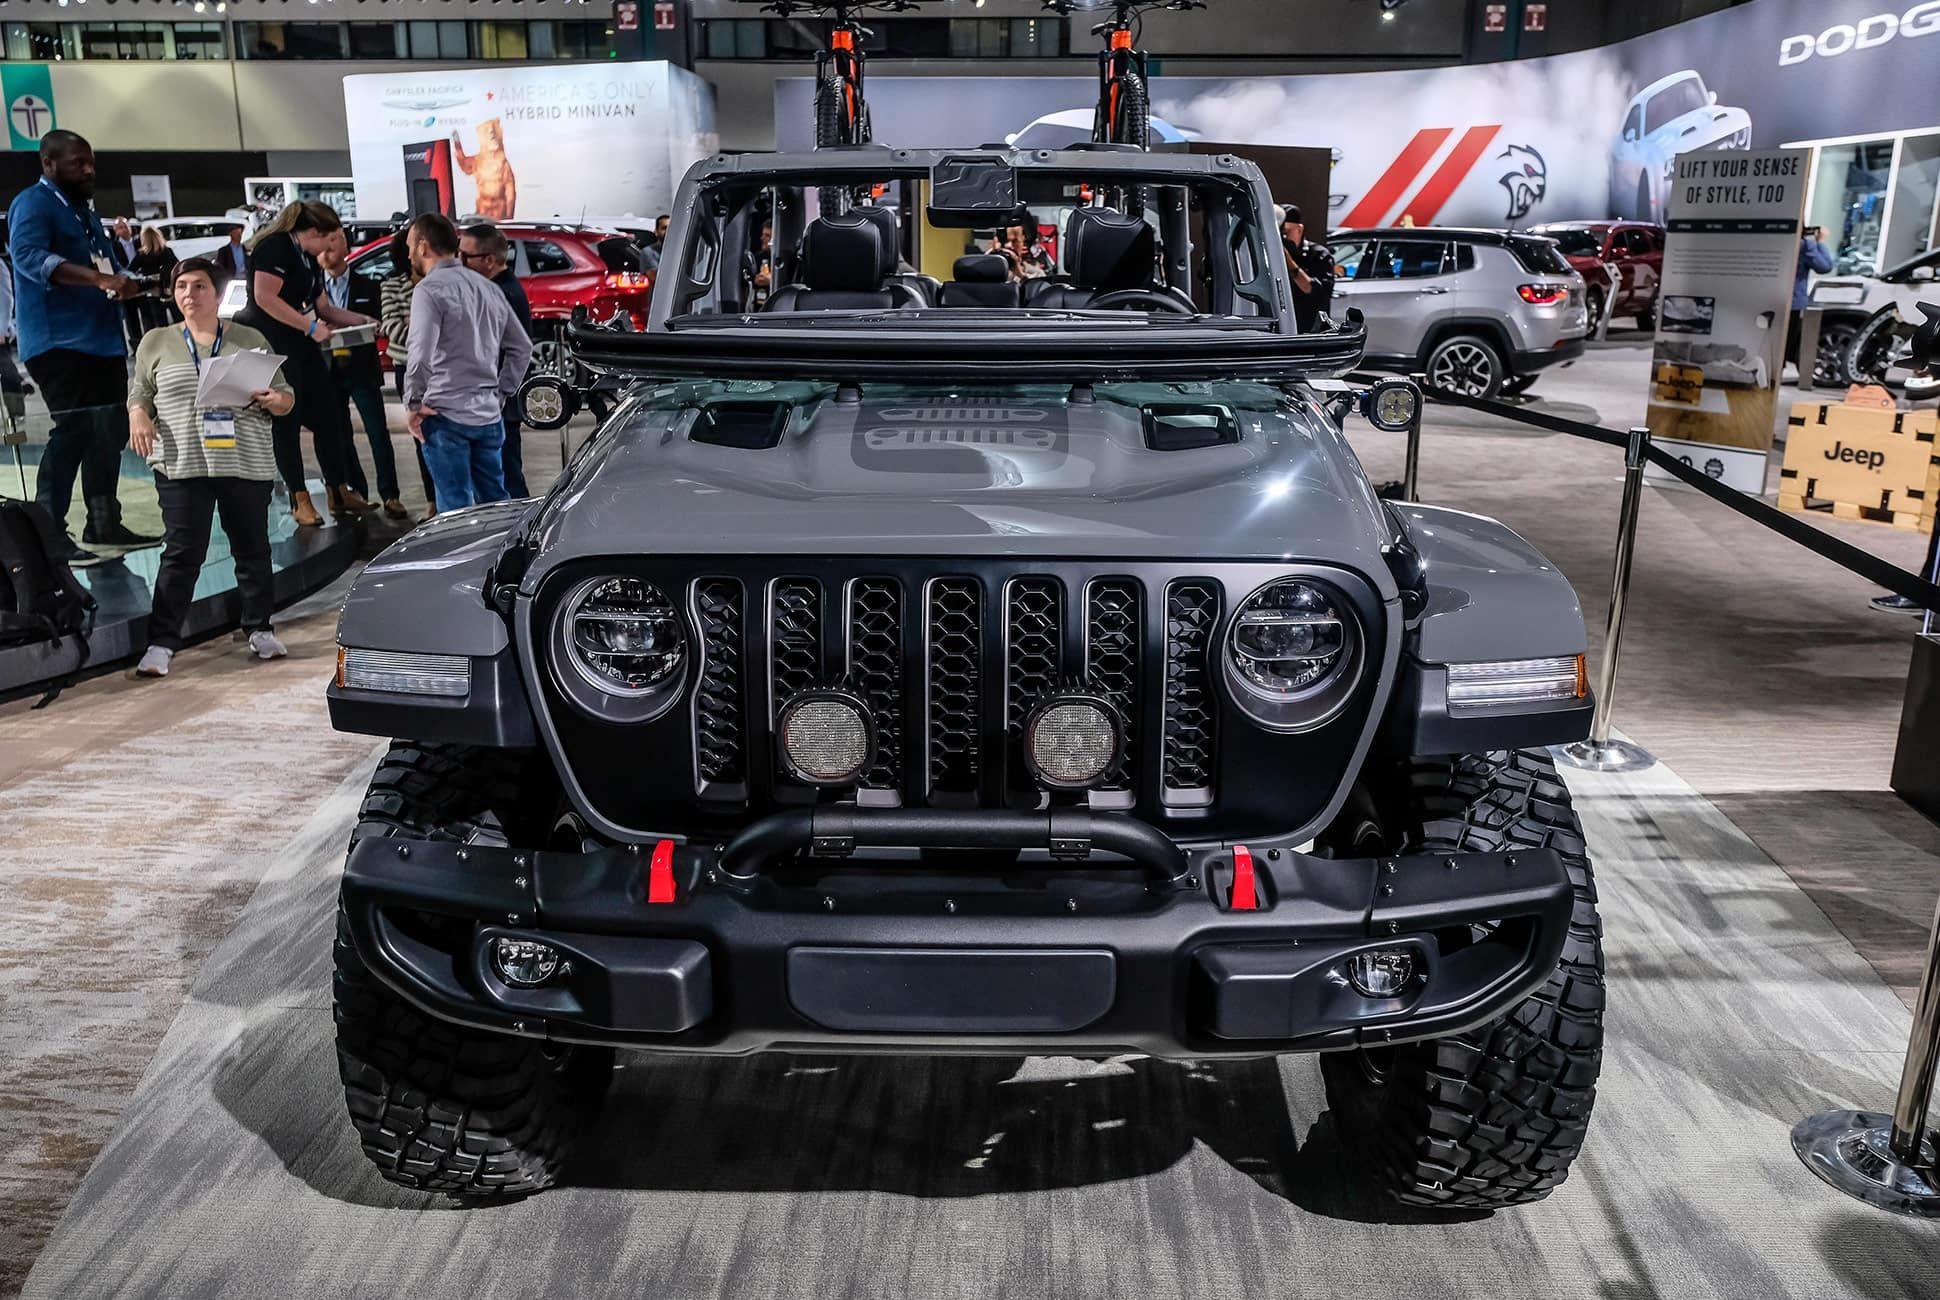 Top-10-LA-Auto-Show-Cars-gear-patrol-Jeep-Gladiator-slide-2